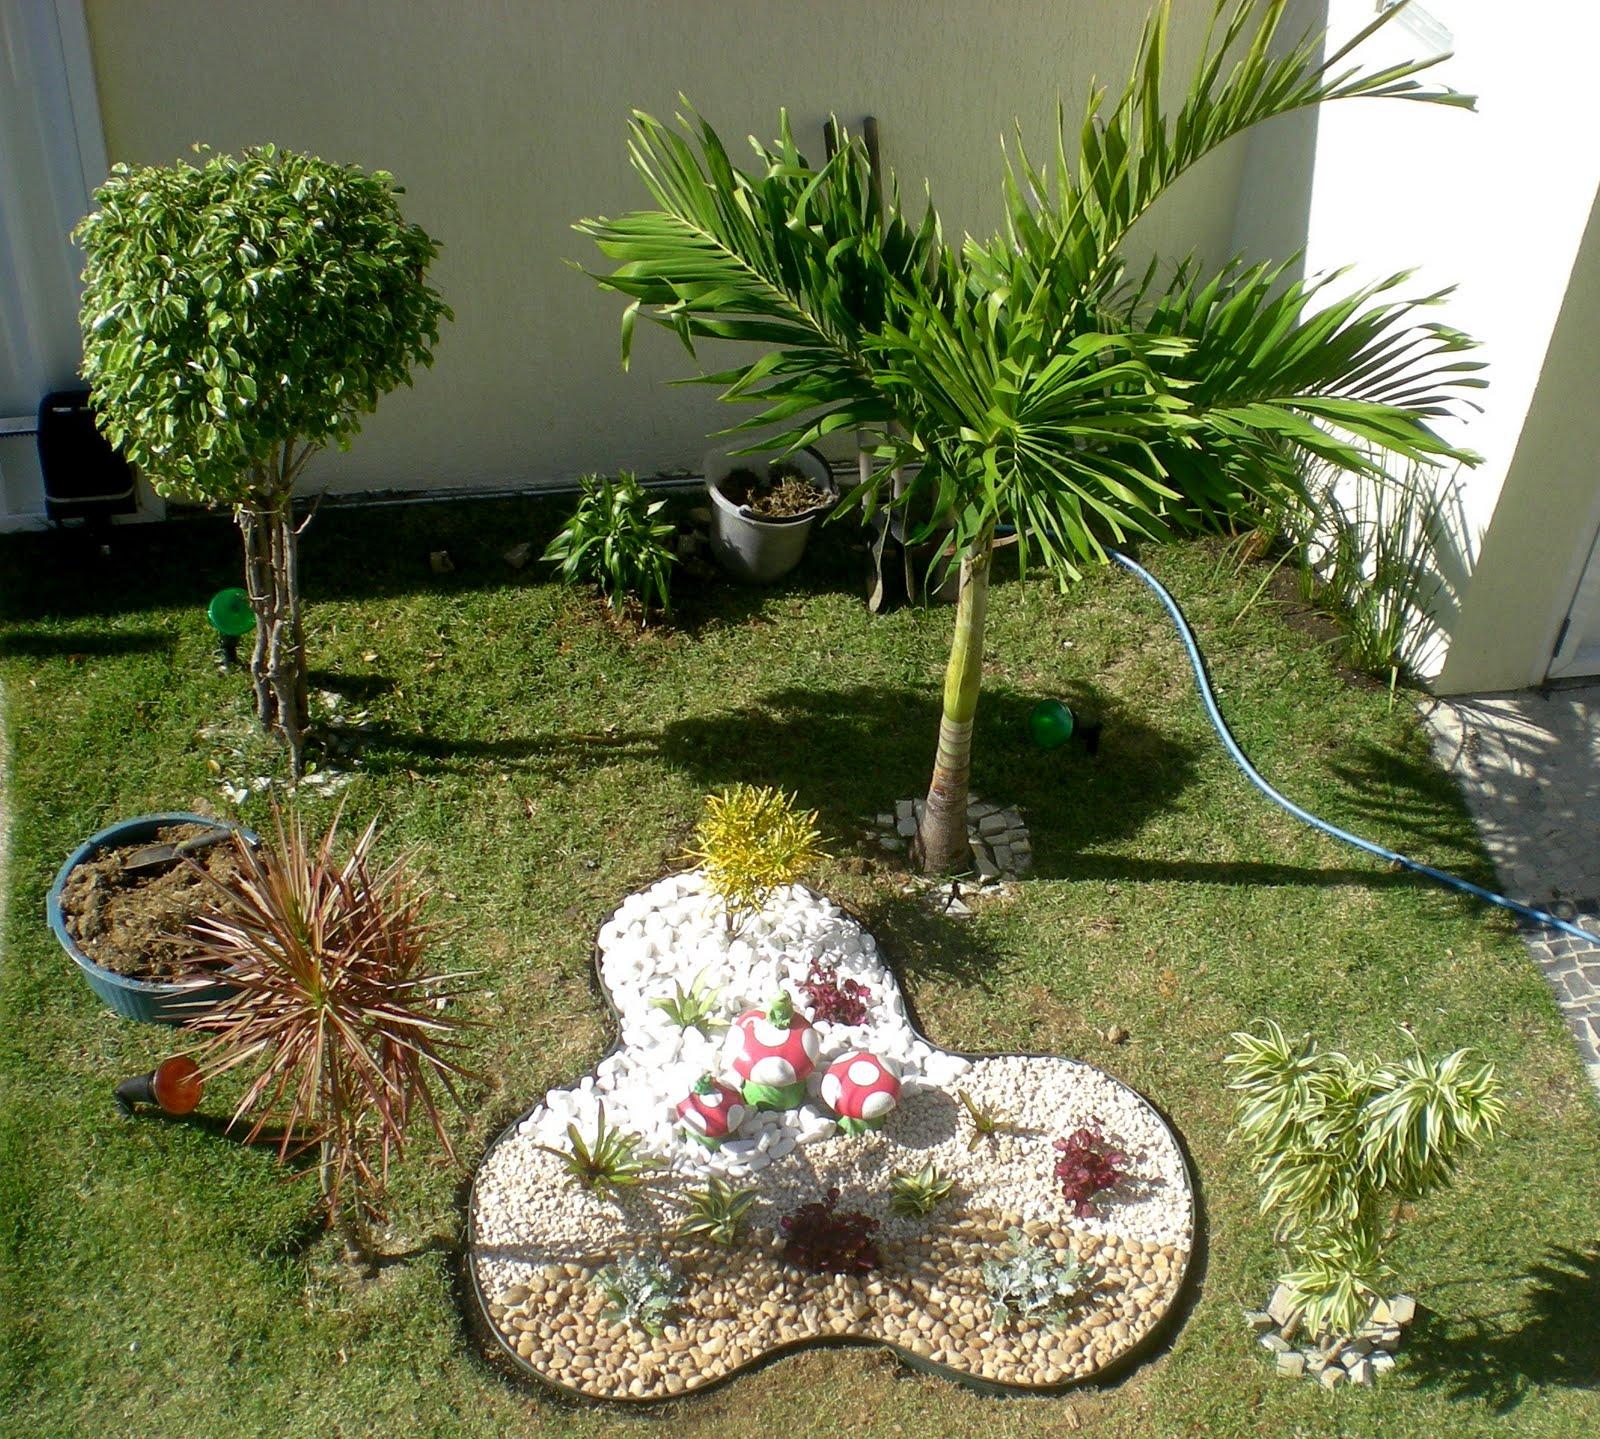 Flores jardins iniciando o jardim ii for Separadores de jardin